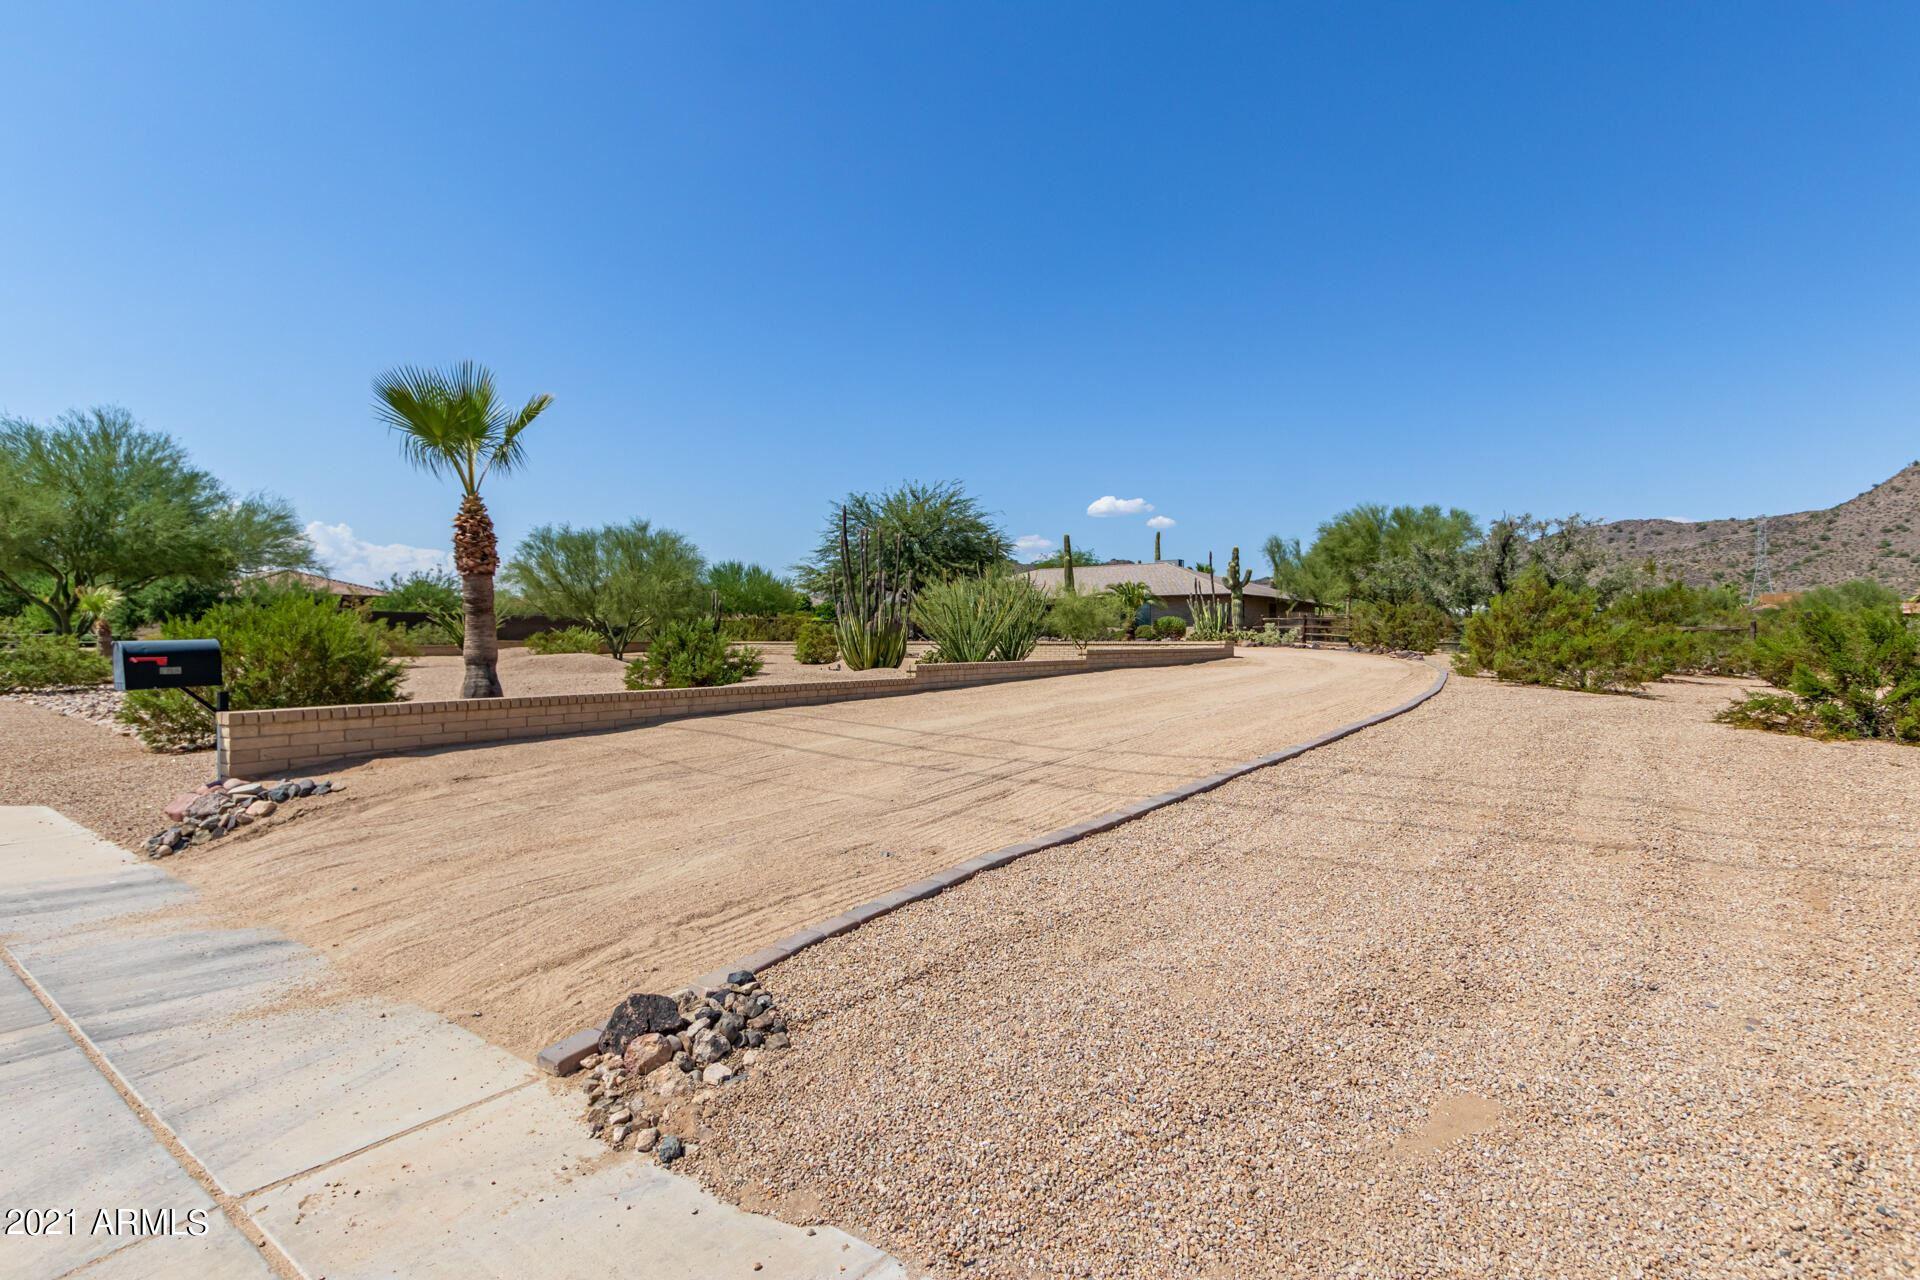 Photo of 8542 W CALLE LEJOS --, Peoria, AZ 85383 (MLS # 6290768)